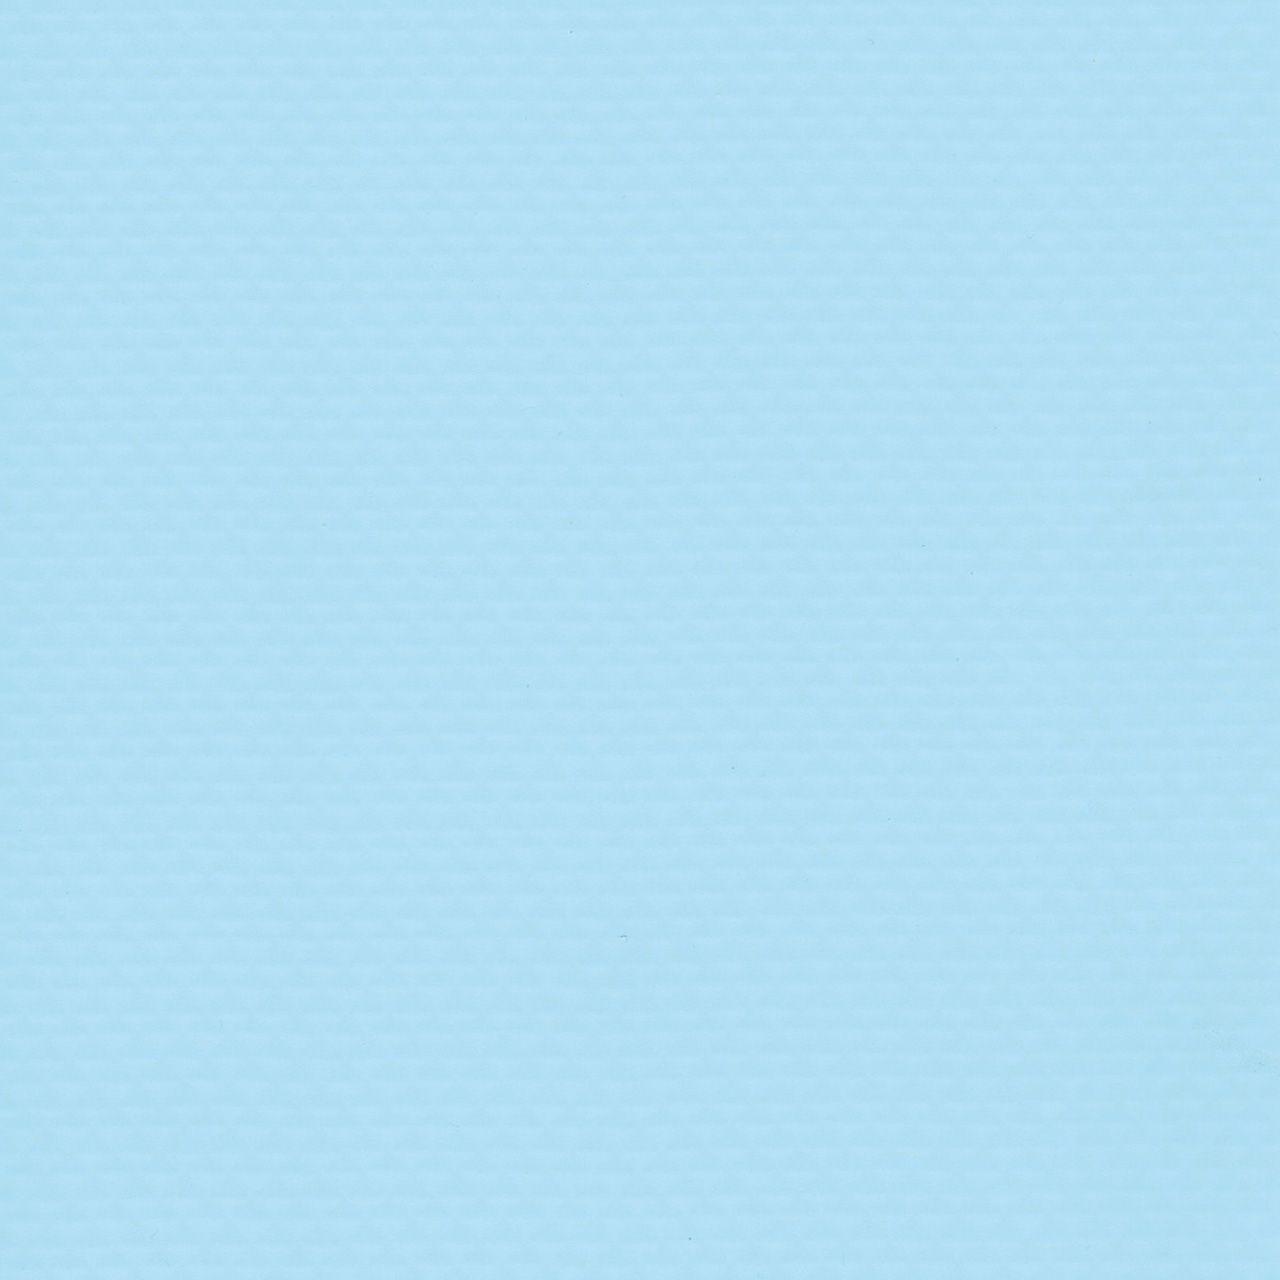 ELBE Classic SBG 150 Schwimmbadfolie Zuschnitt per m